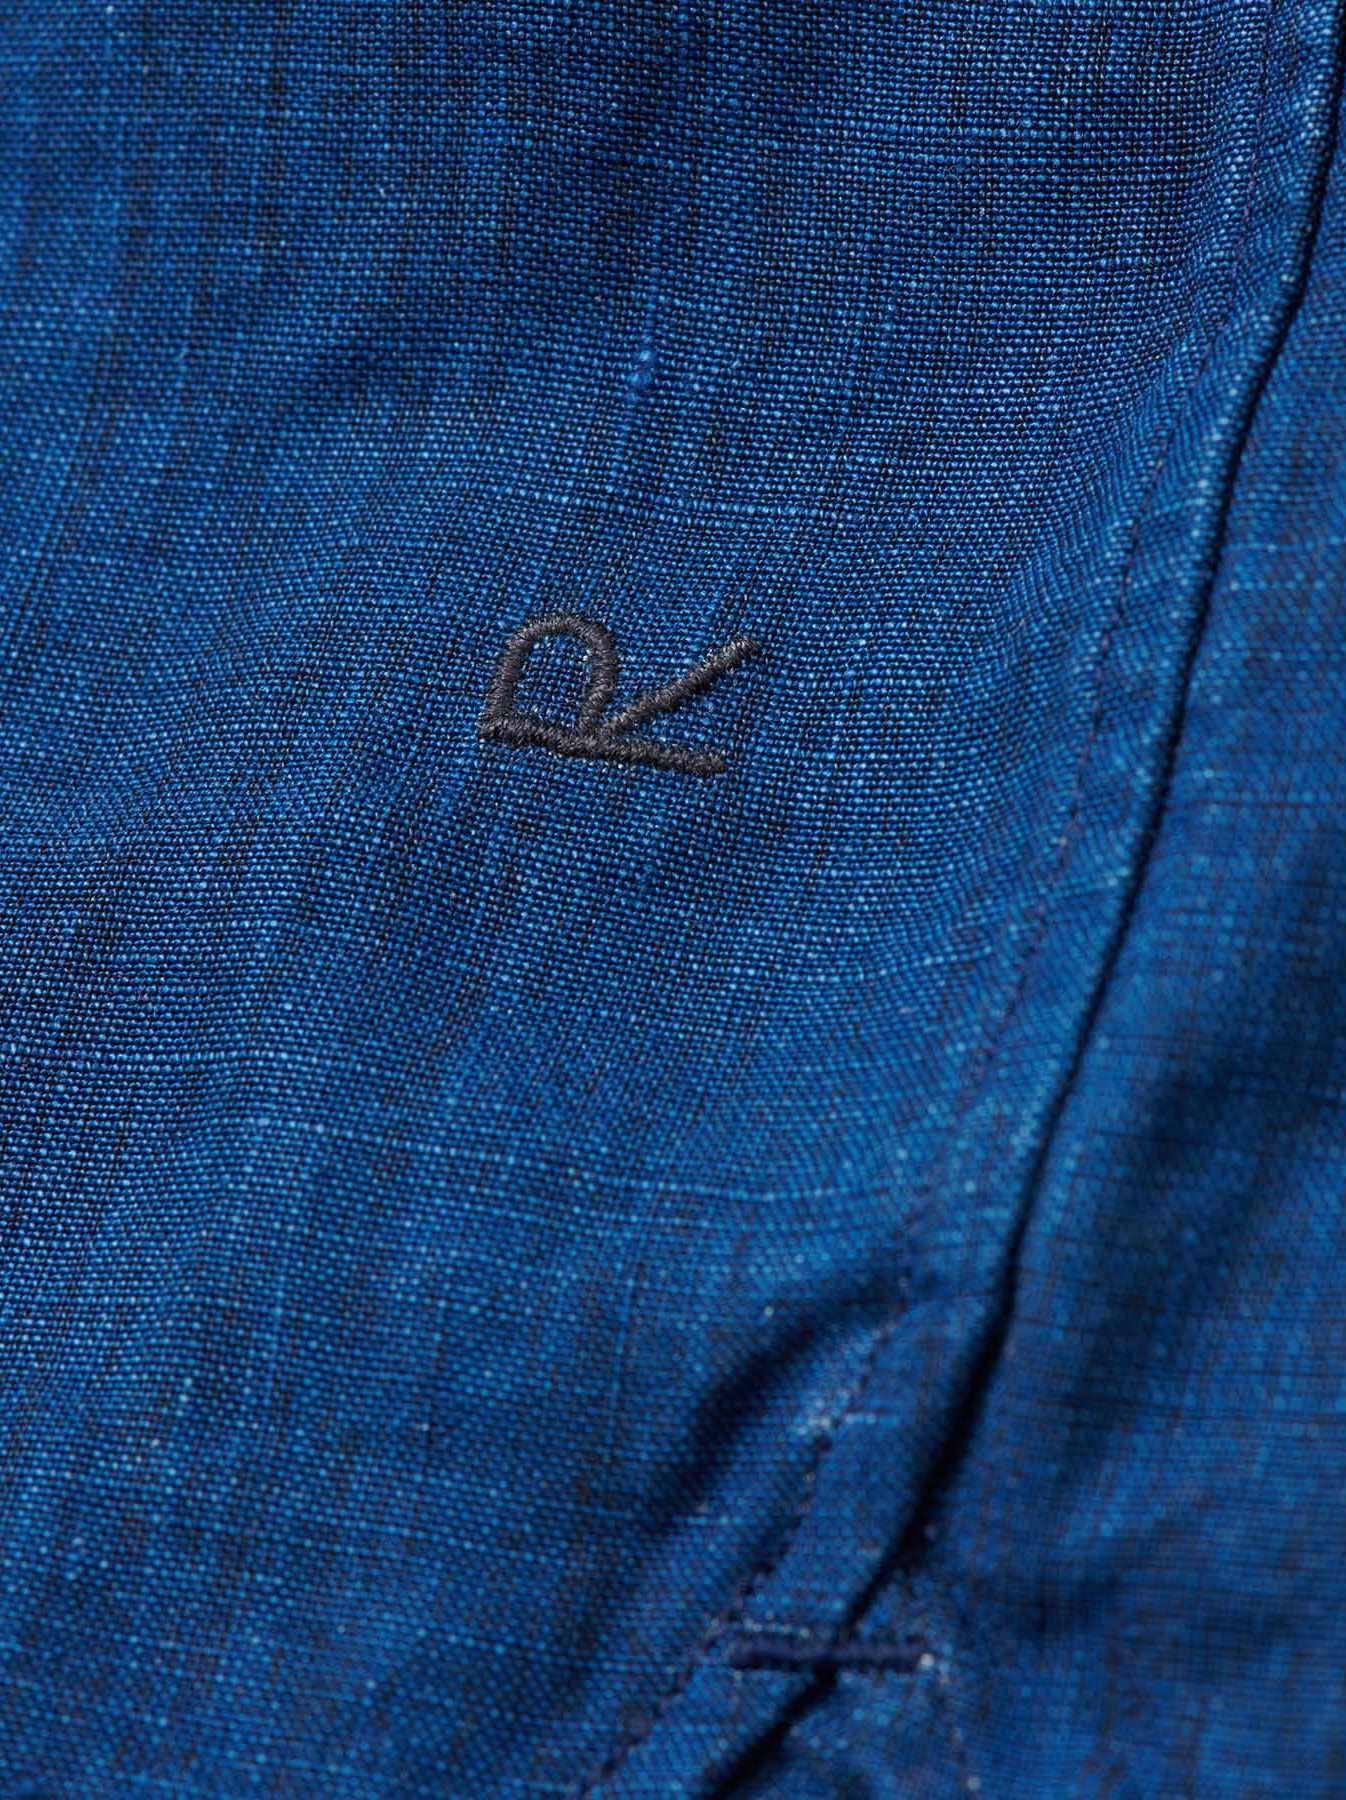 WH Indigo Linen Pin-tuck 908 Shirt-11